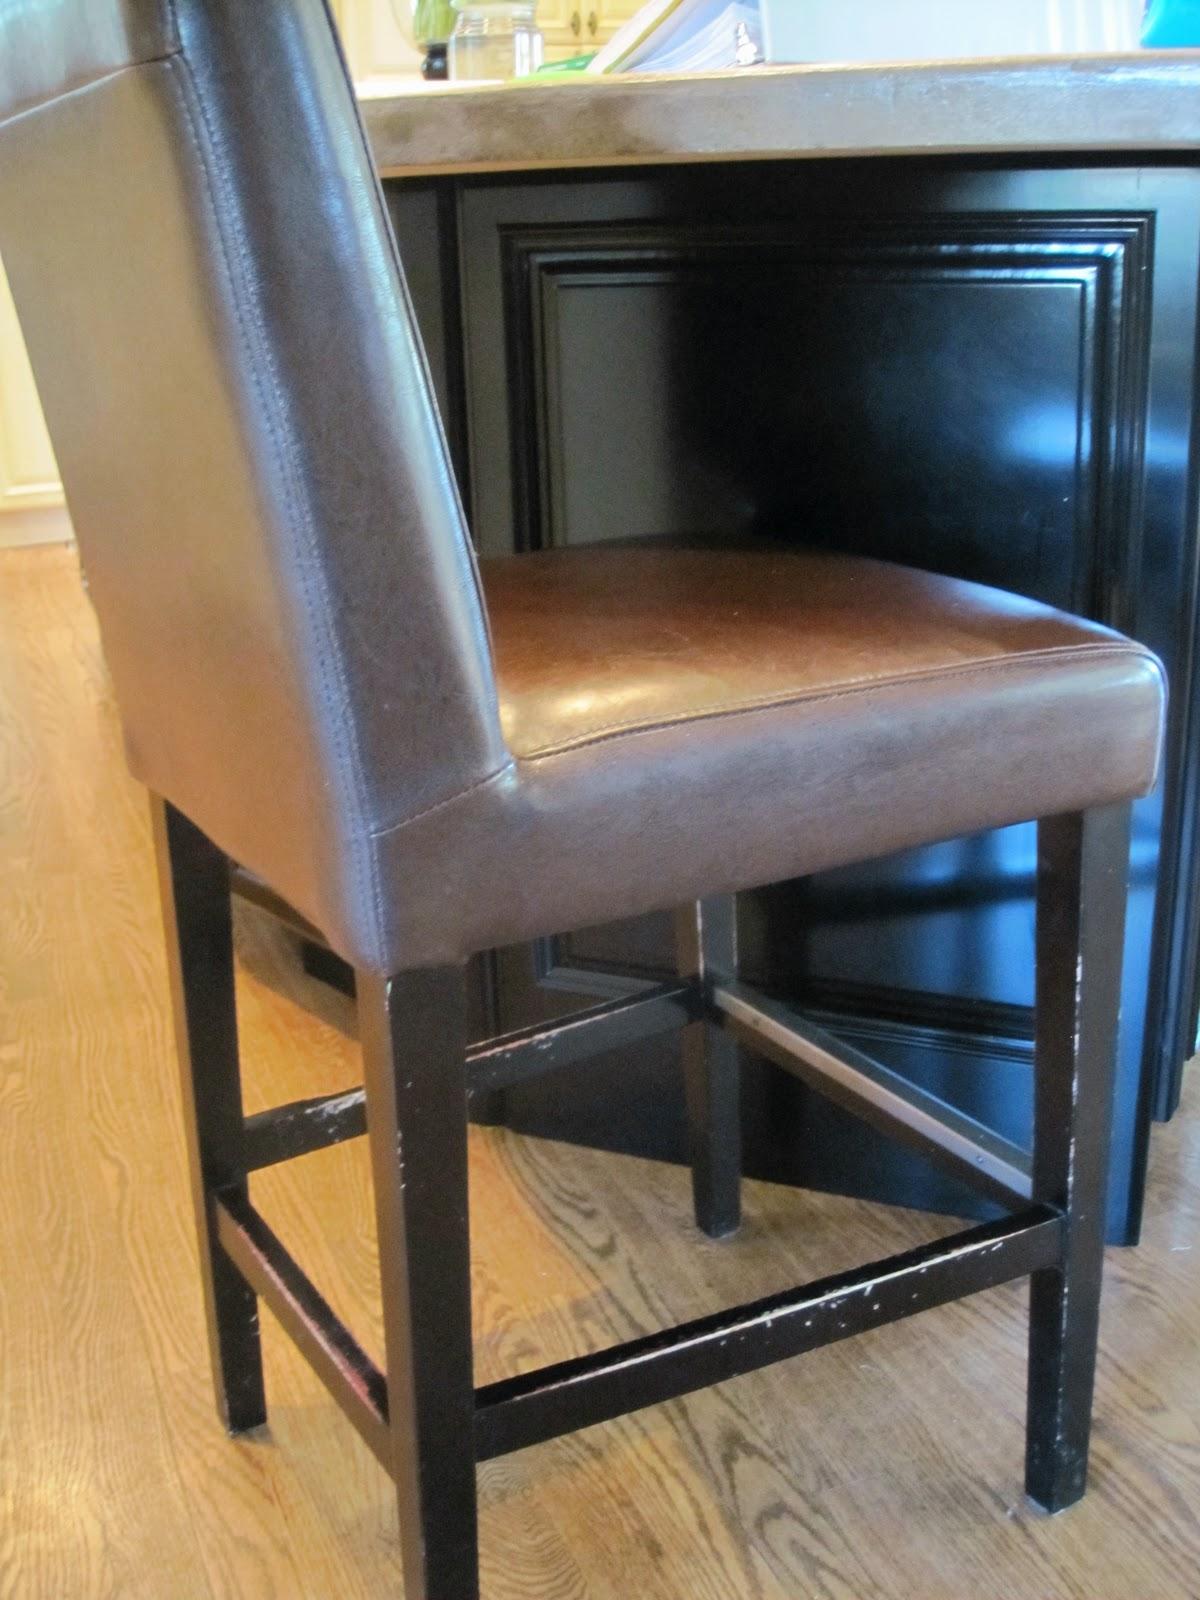 bar stool chair rung protectors diameter simple details barstool slipcover reveal